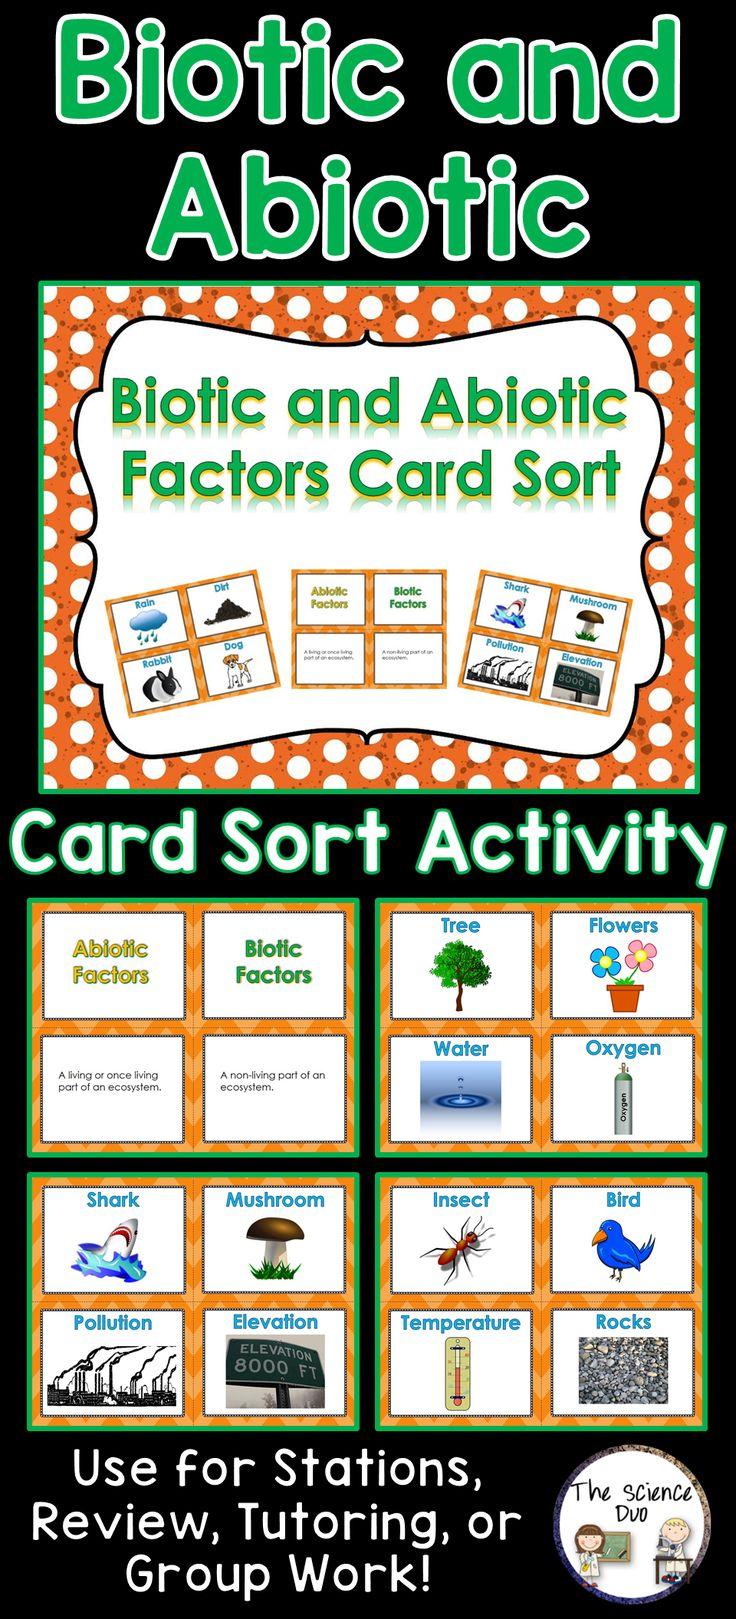 Biotic and Abiotic Factors Card Sort. Challenge your students to differentiate between the living (Biotic) and non-living (Abiotic) factors of ecosystems.